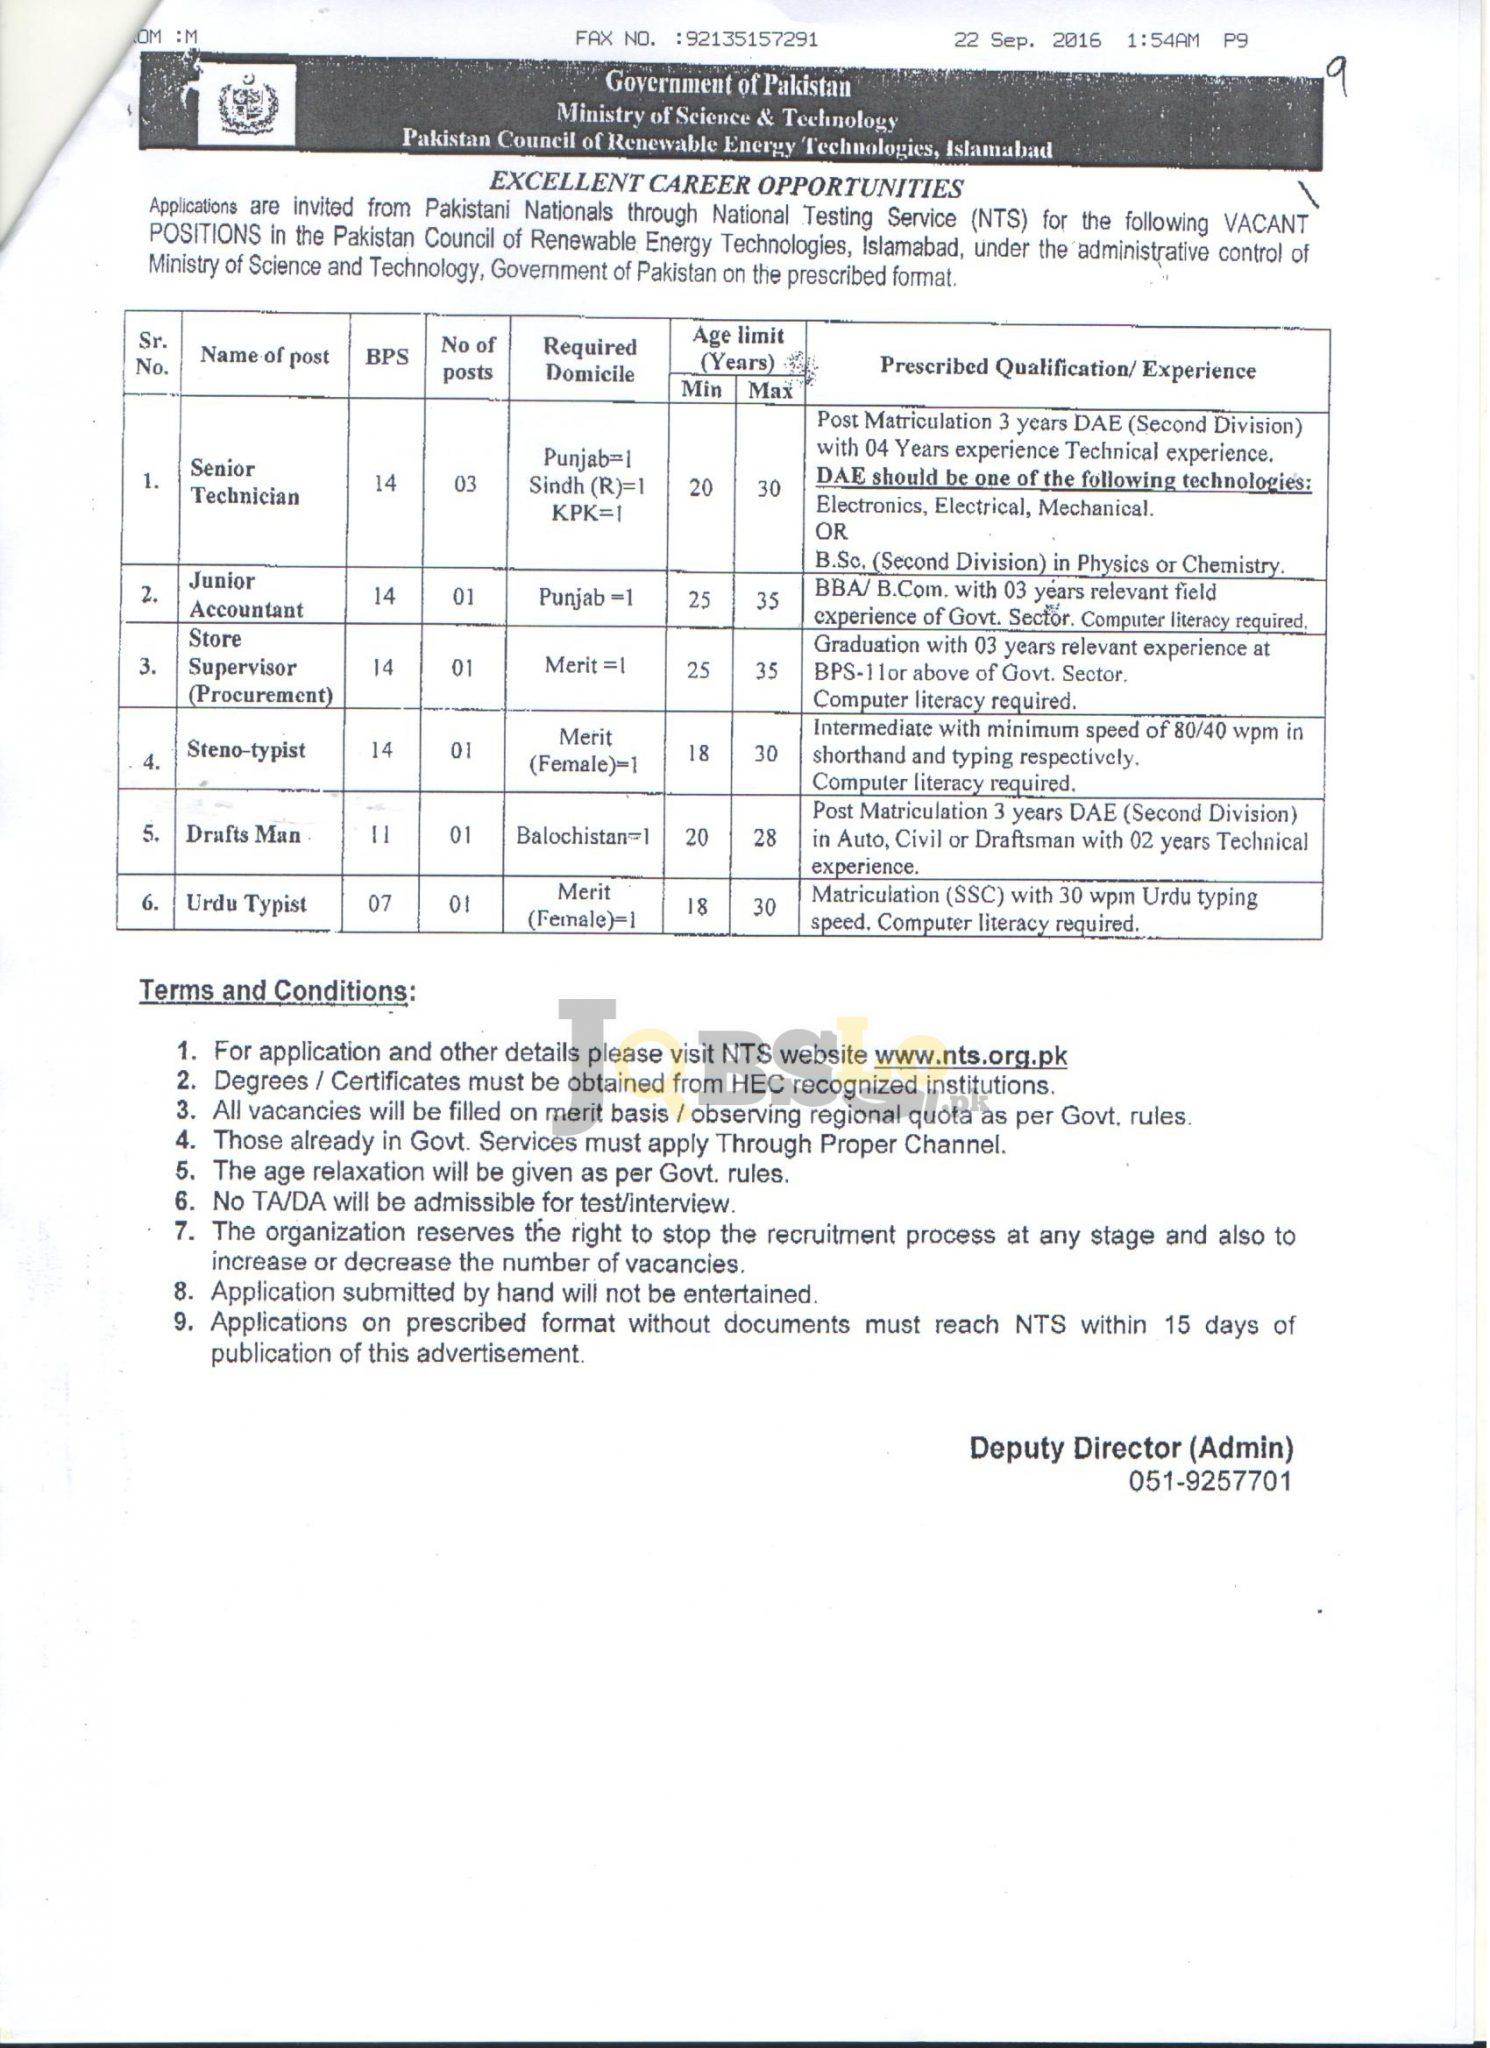 Pakistan Council of Renewable Energy Technologies Islamabad Jobs 2016 NTS Test & Sample Paper